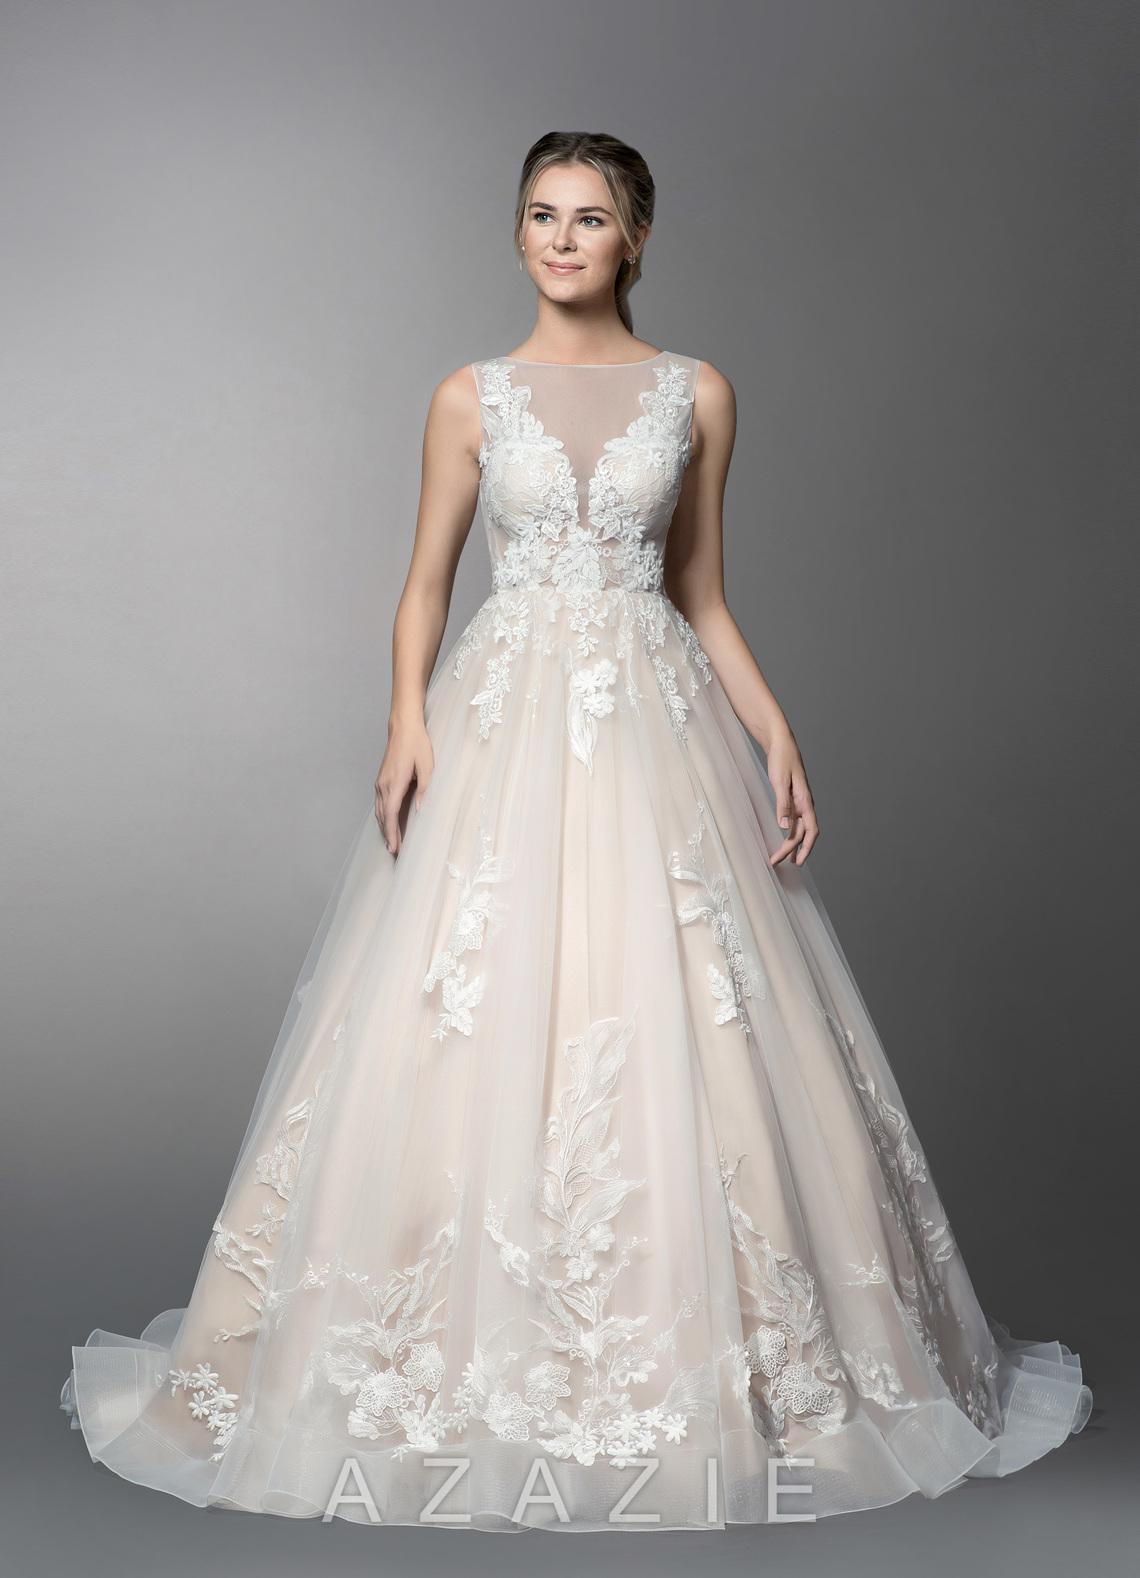 c4ea2ecd2d Azazie Sedona BG Sample Dress | Azazie